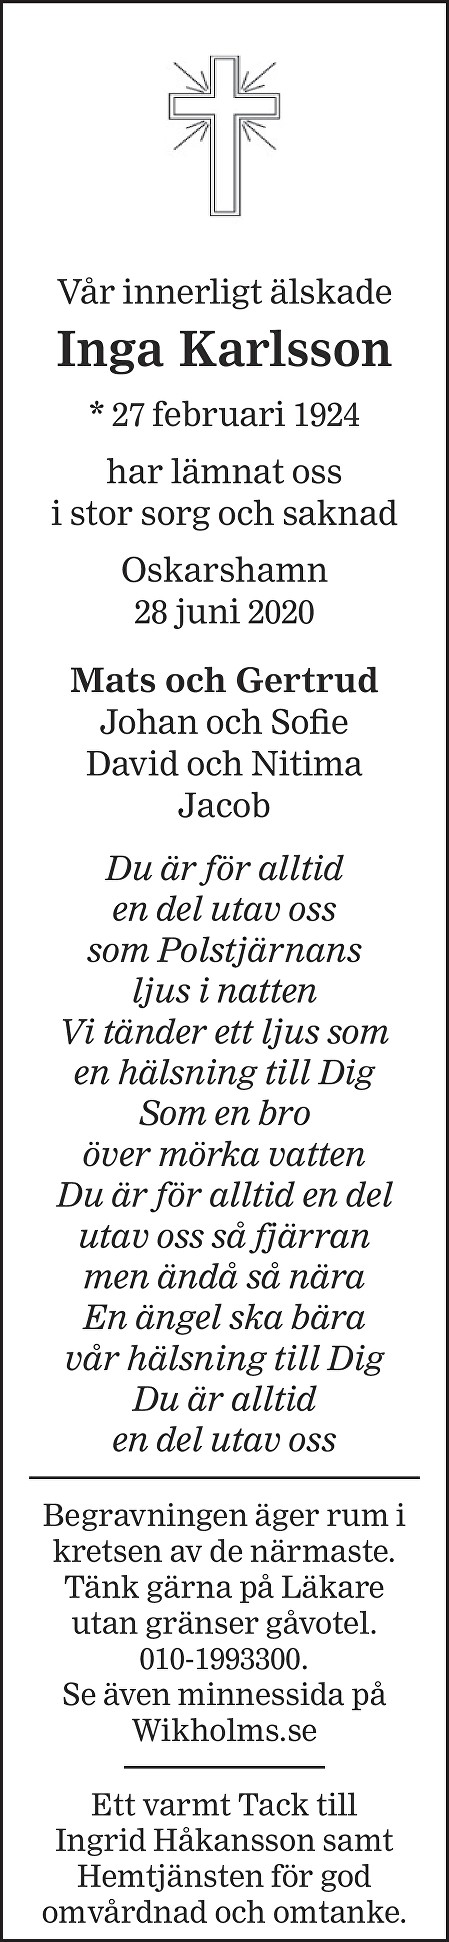 Inga Karlsson Death notice